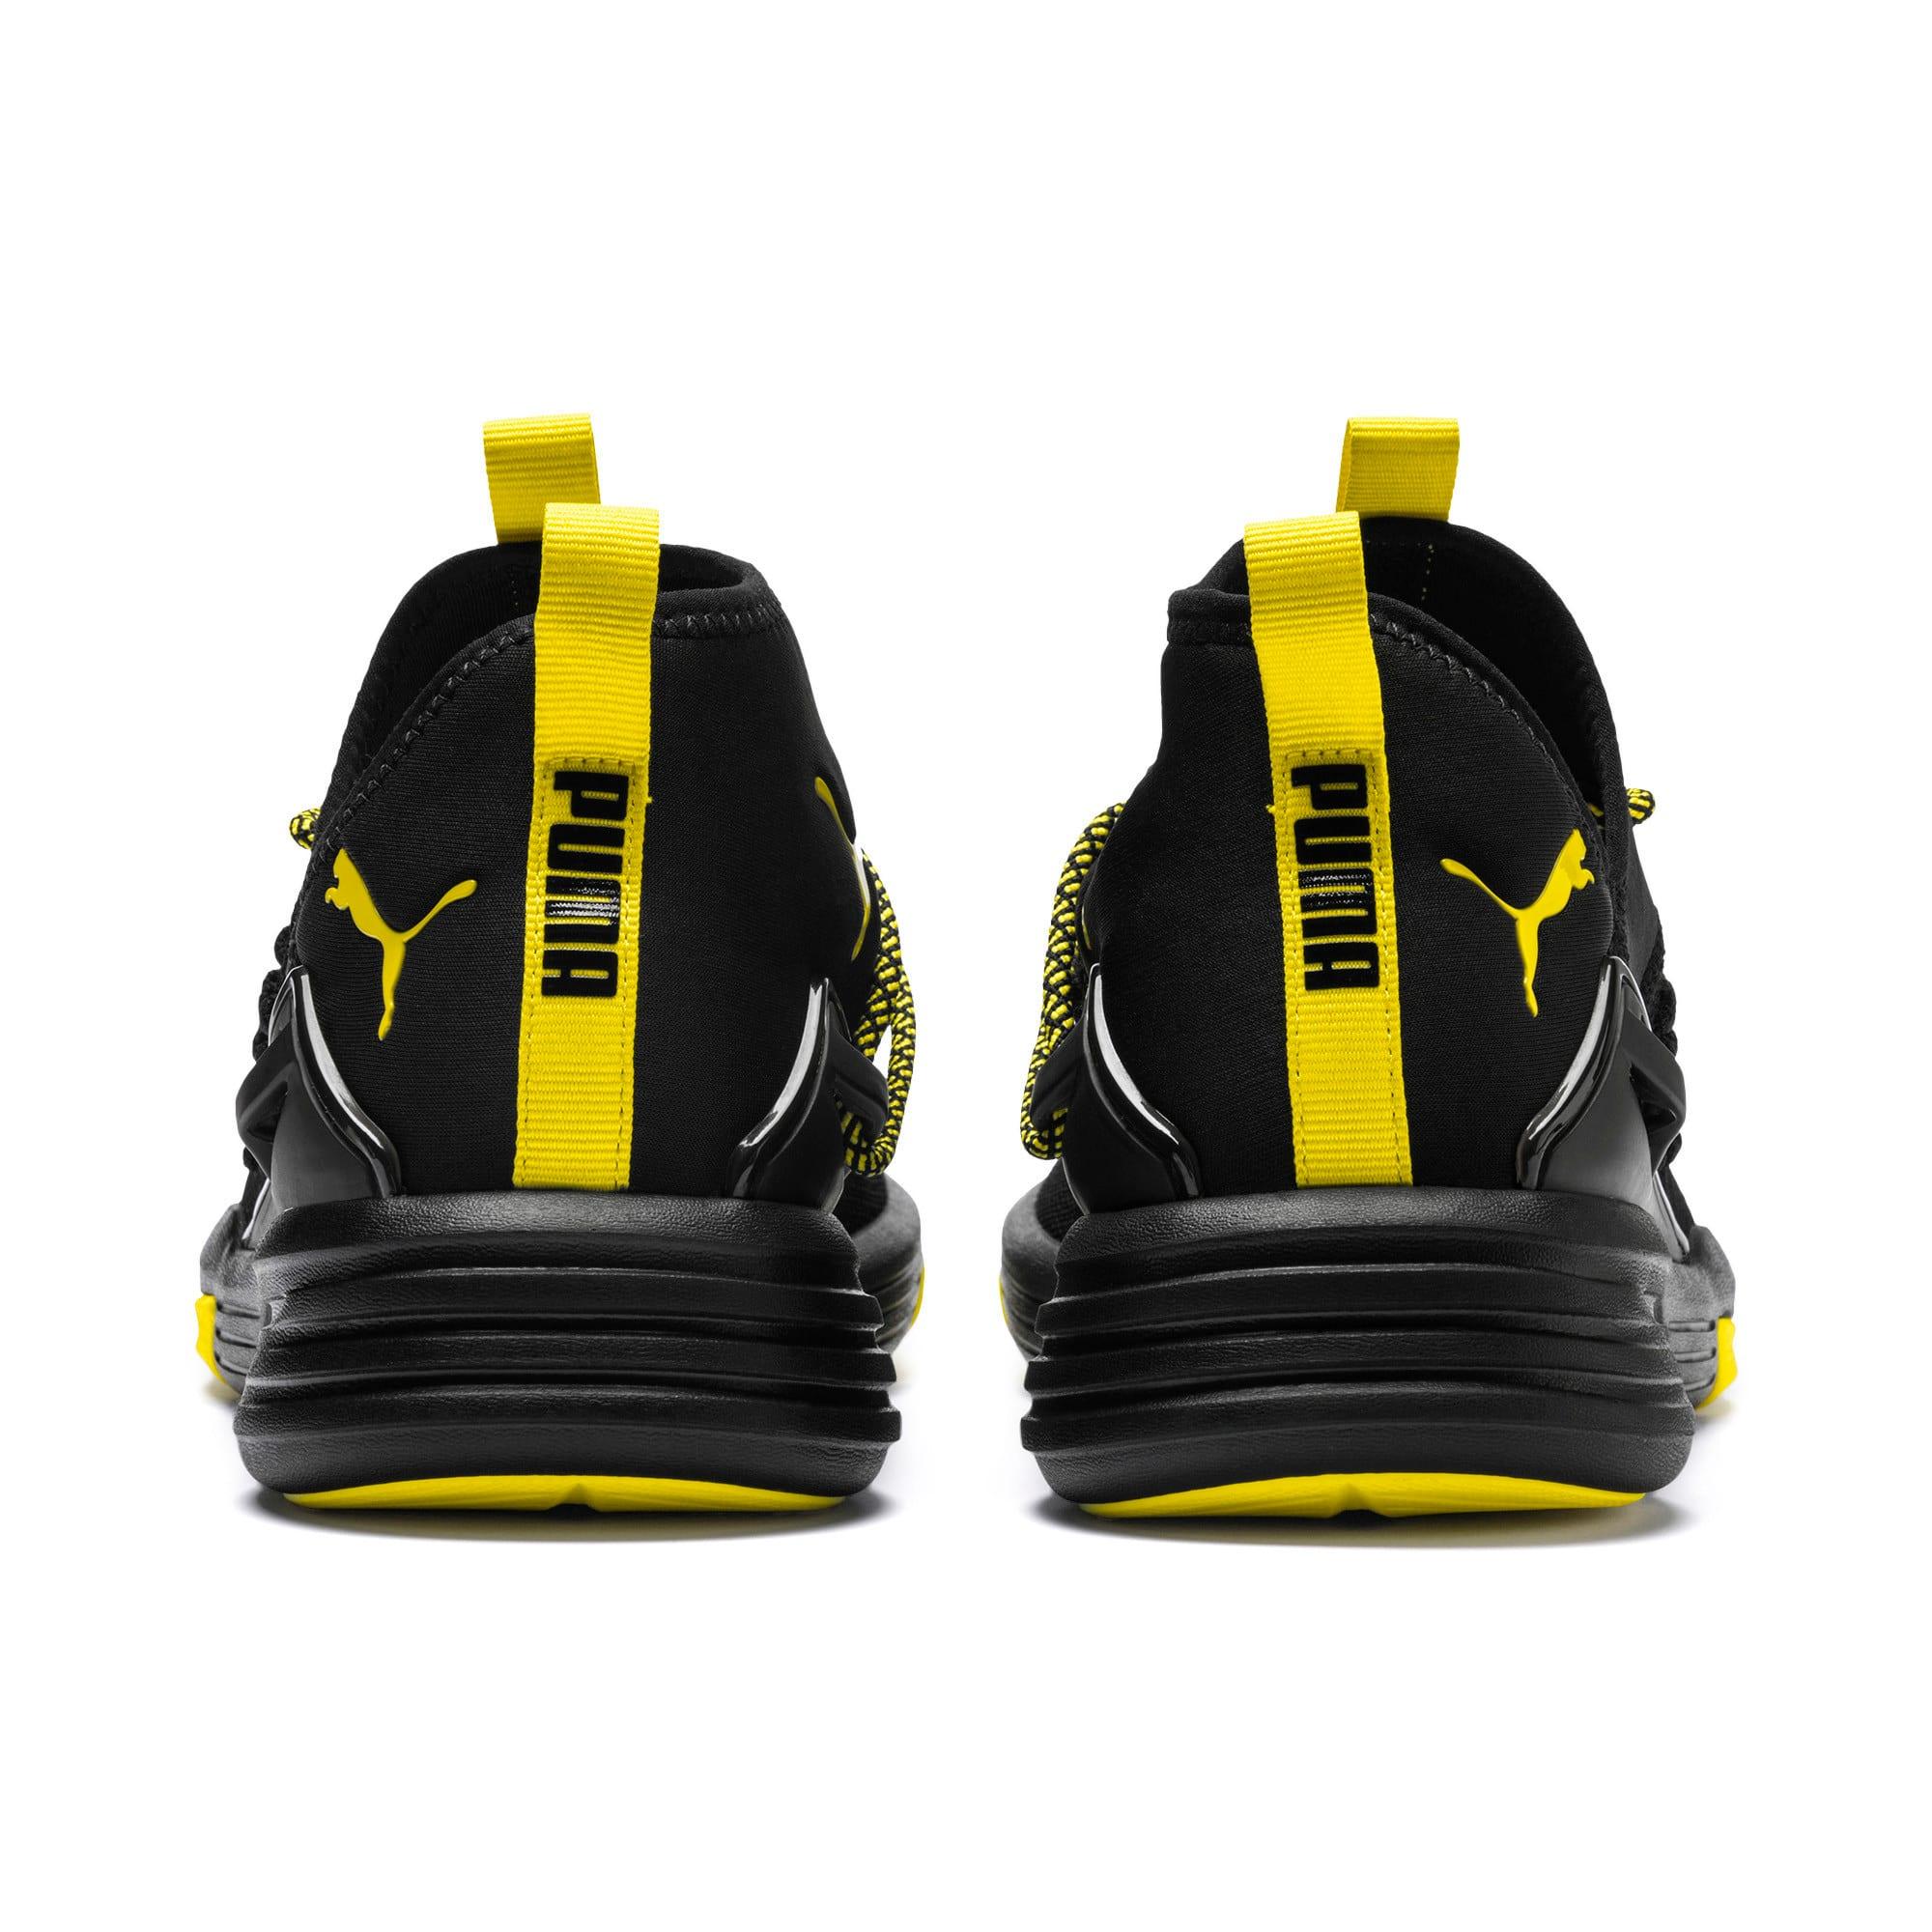 Thumbnail 3 of Mantra Caution Men's Training Shoes, Puma Black-Blazing Yellow, medium